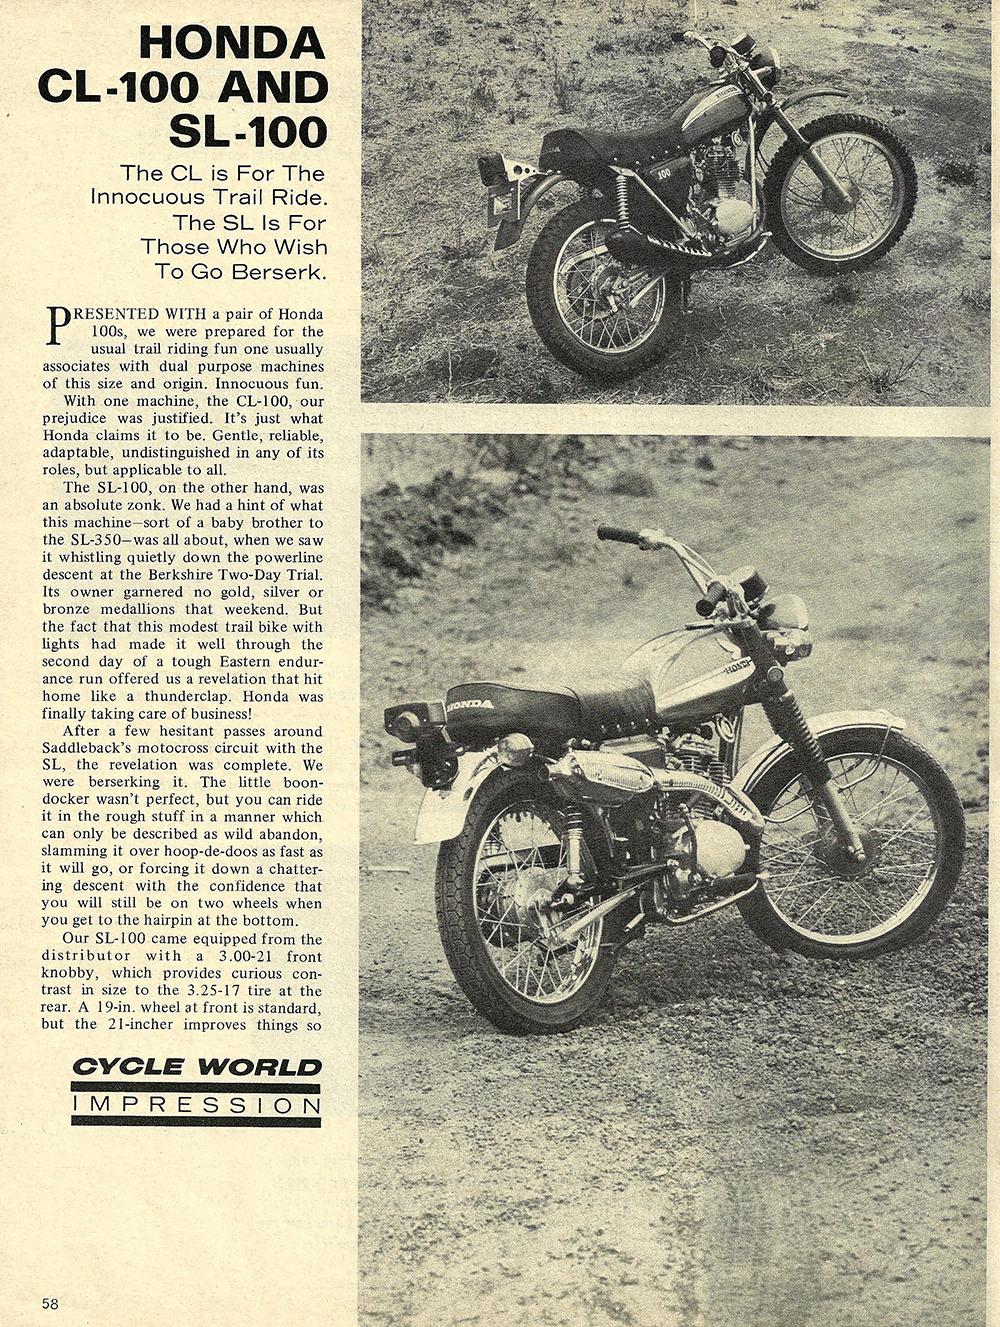 1970 Honda CL100 and SL100 road test 01.jpg